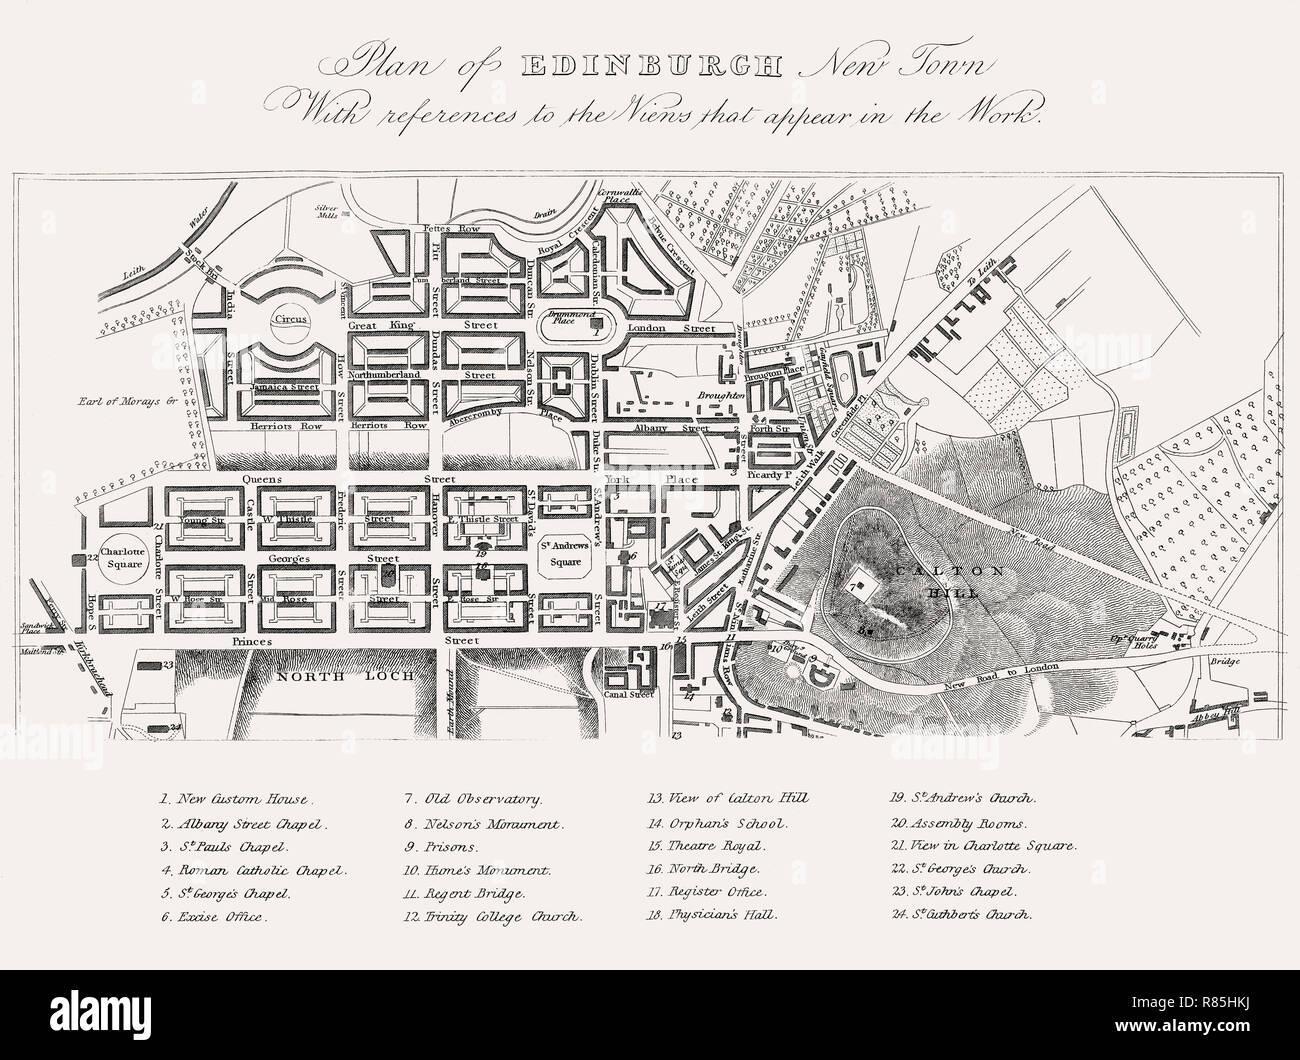 Plan of Edinburgh, New Town in 1820, Scotland, 19th century, Views in Edinburgh by J. & H. S. Storer, 1820 - Stock Image